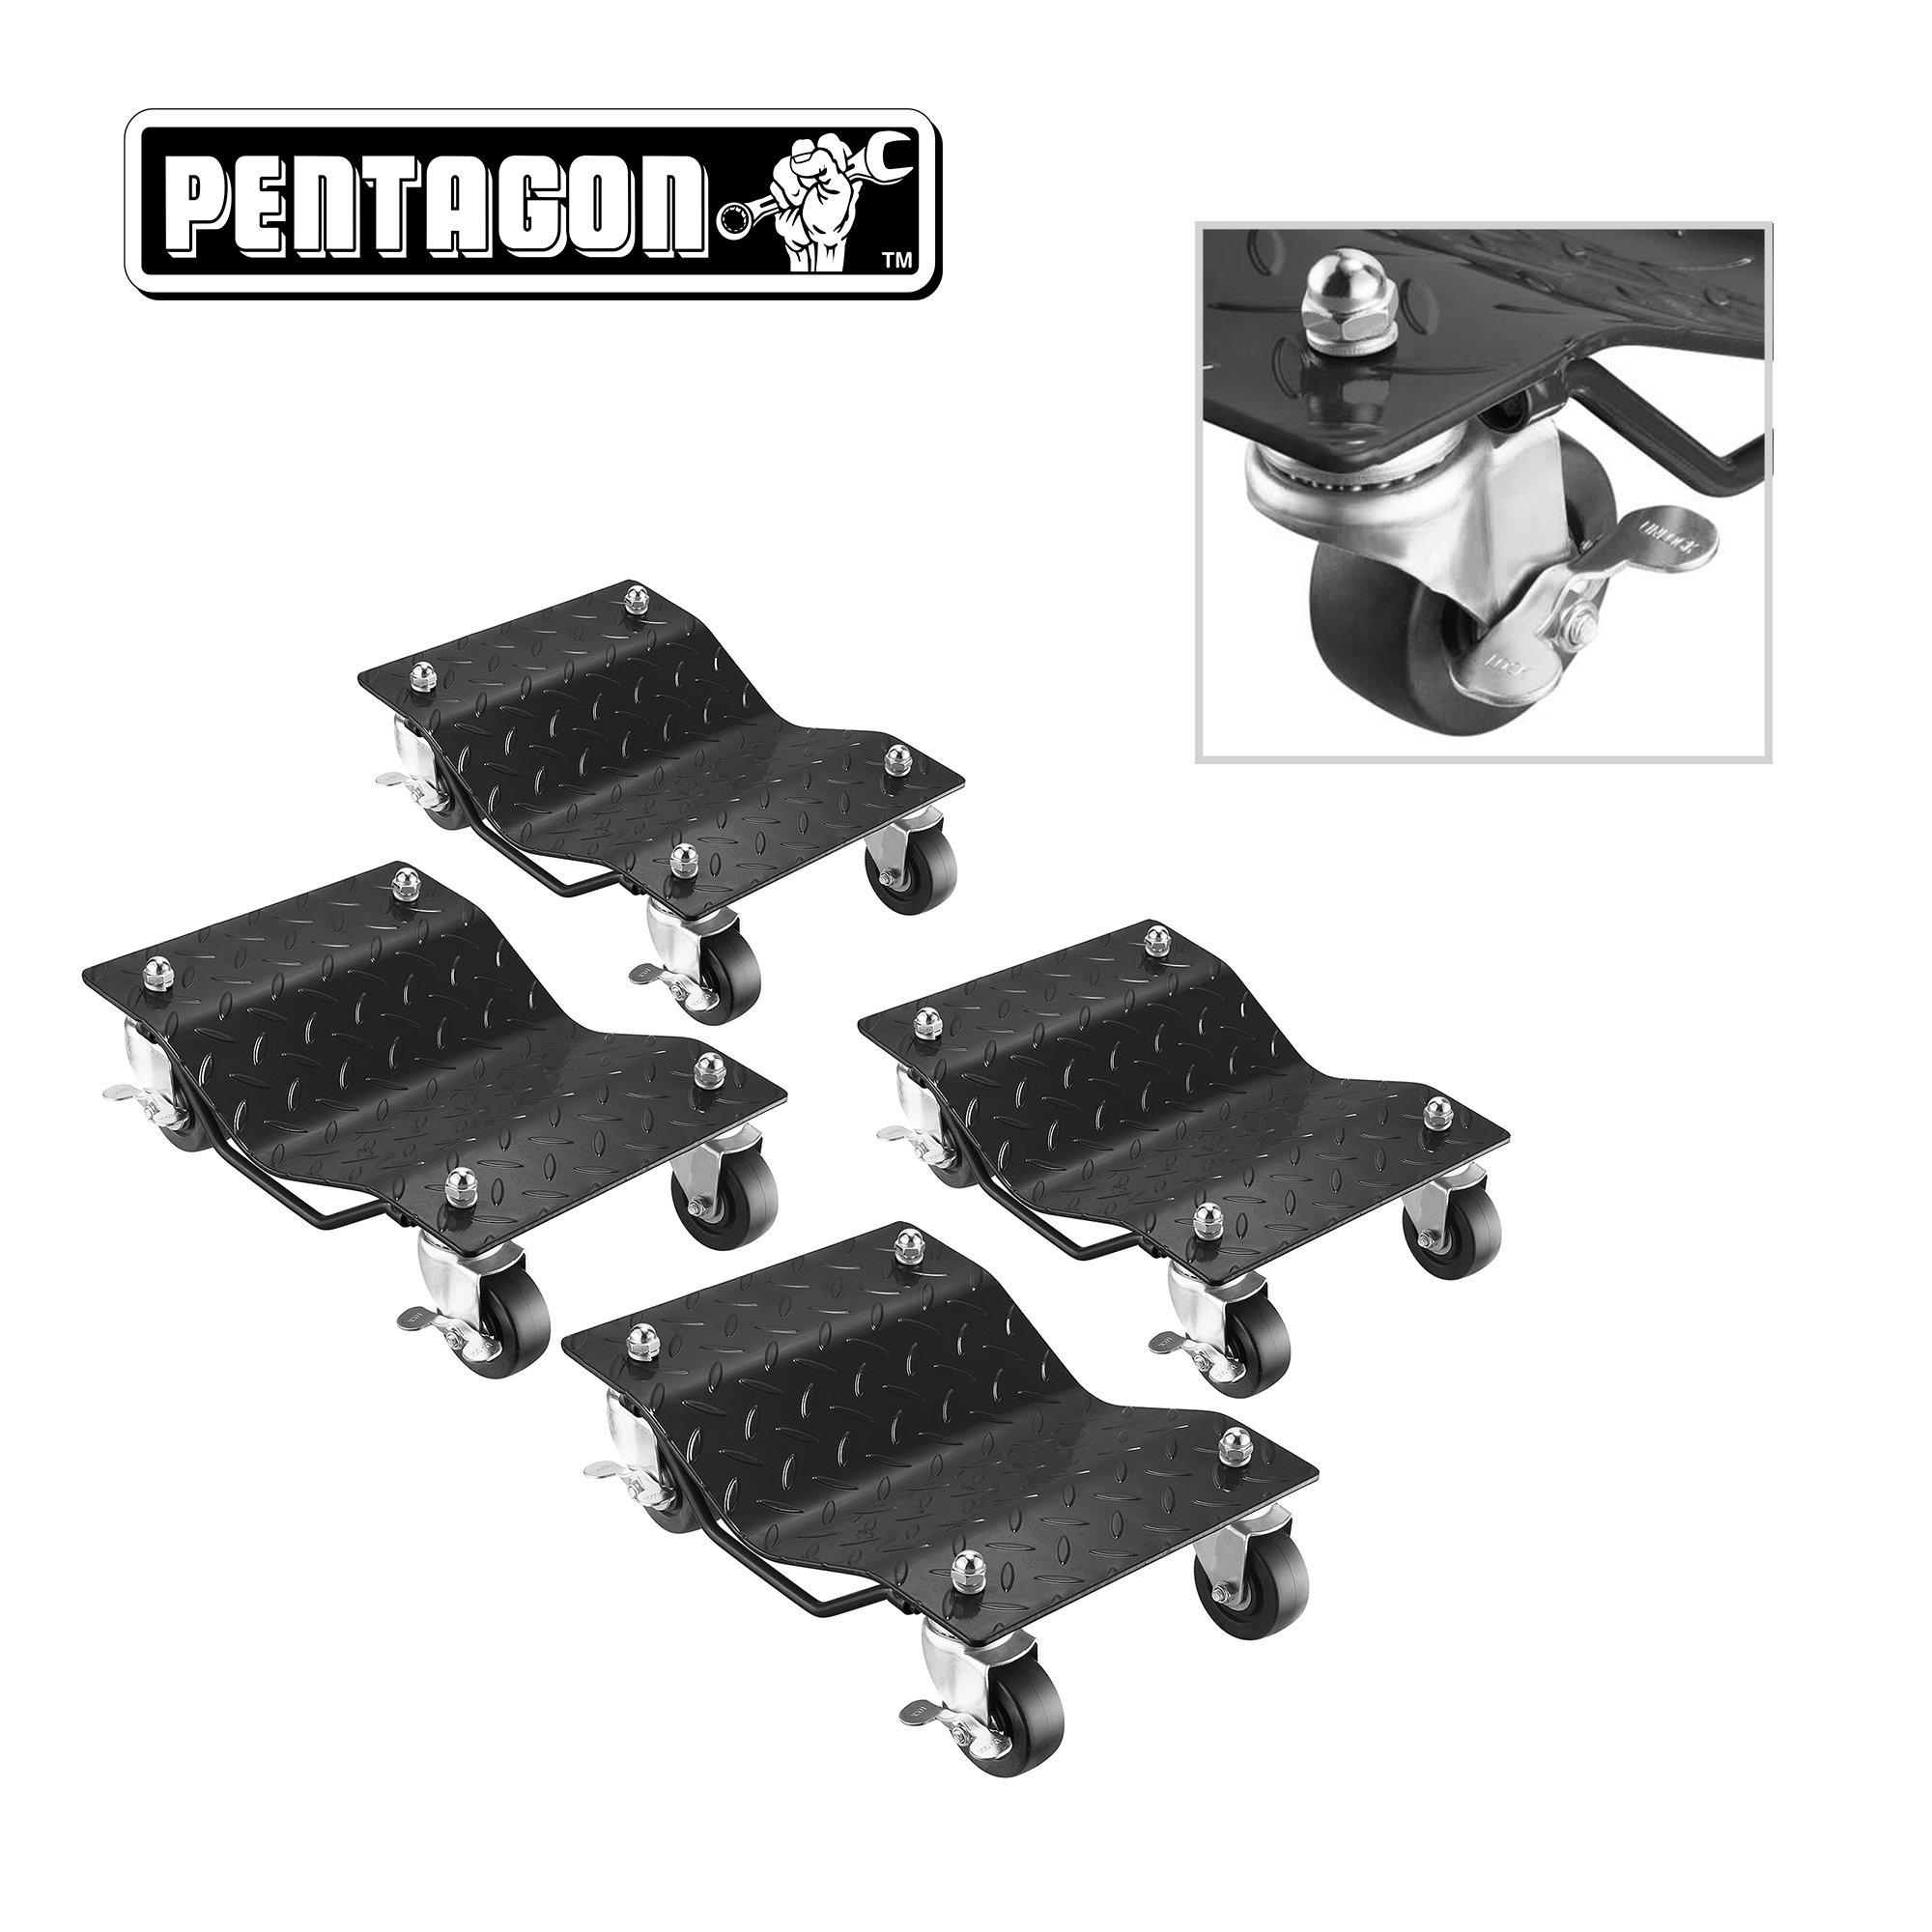 Pentagon Tool | Premium 4-Pack | Car Tire Dolly - Tire Skates | 1,500 lbs Rating | Black by Pentagon